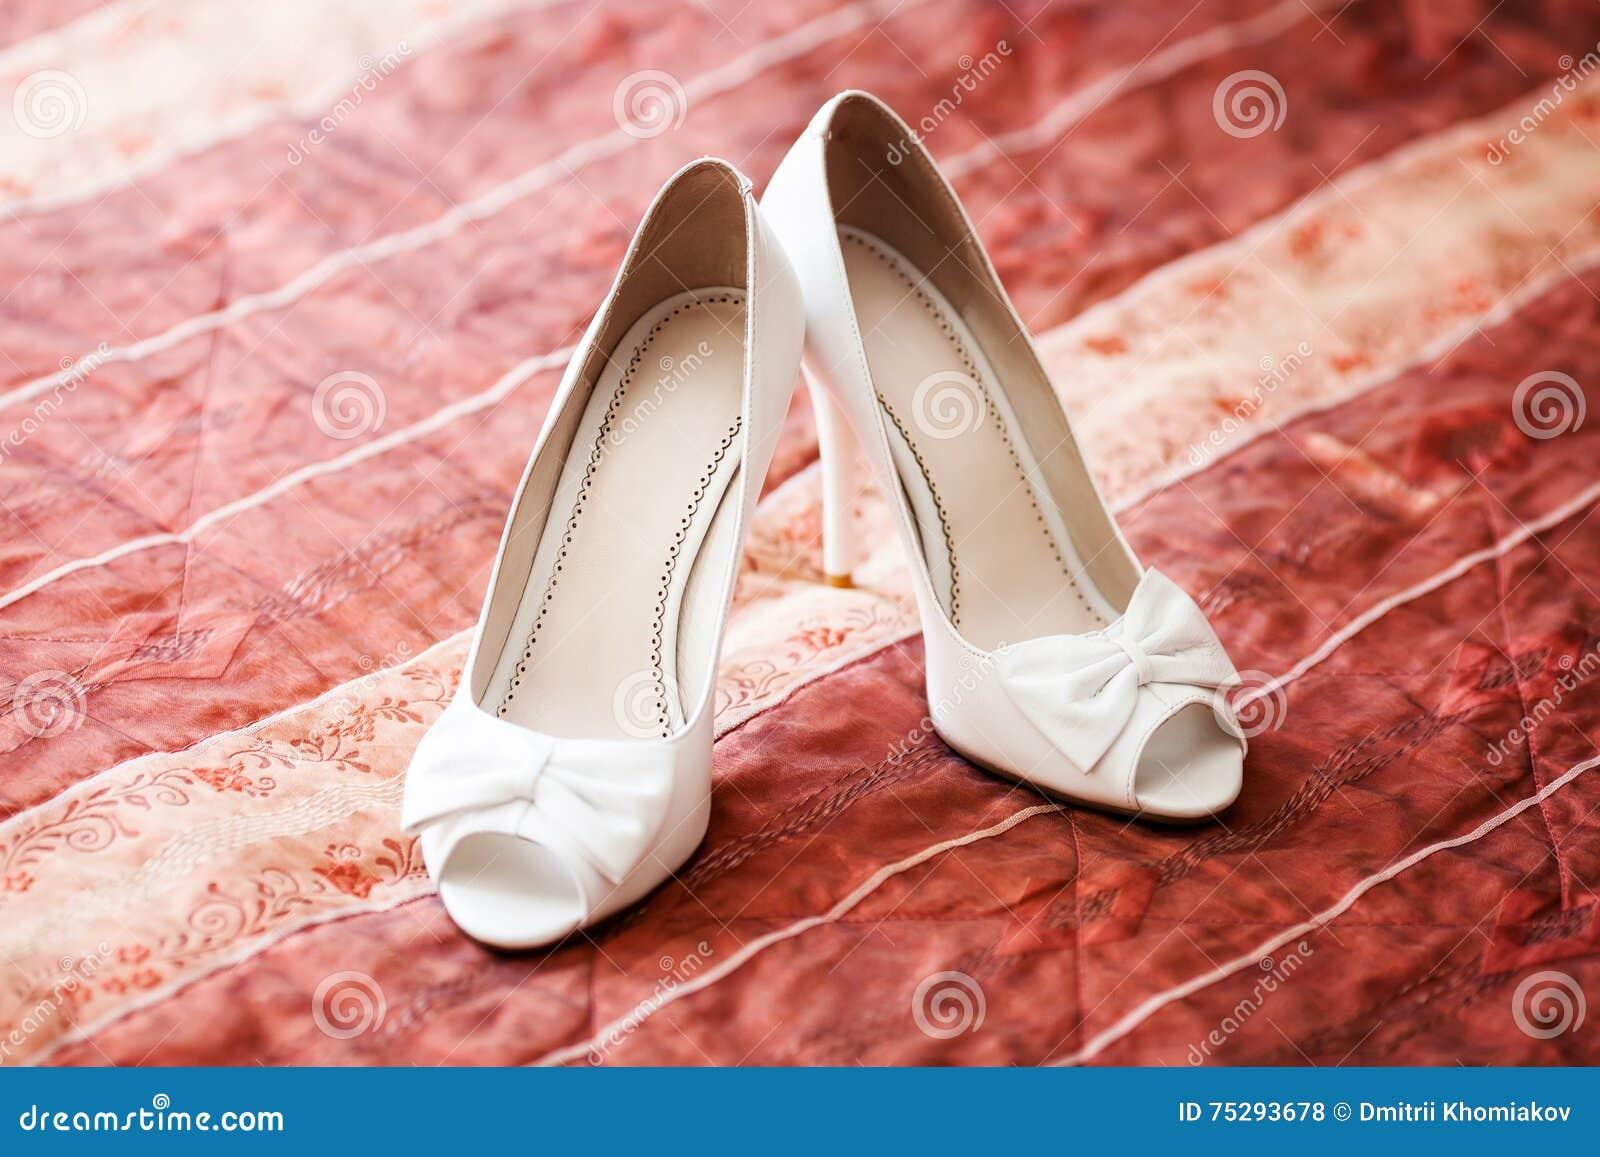 abb113be79d0 Μοντέρνα άσπρα νυφικά γαμήλια παπούτσια στον κόκκινο καναπέ έννοια γάμου.  Περισσότερες παρόμοιες στοκ εικόνες